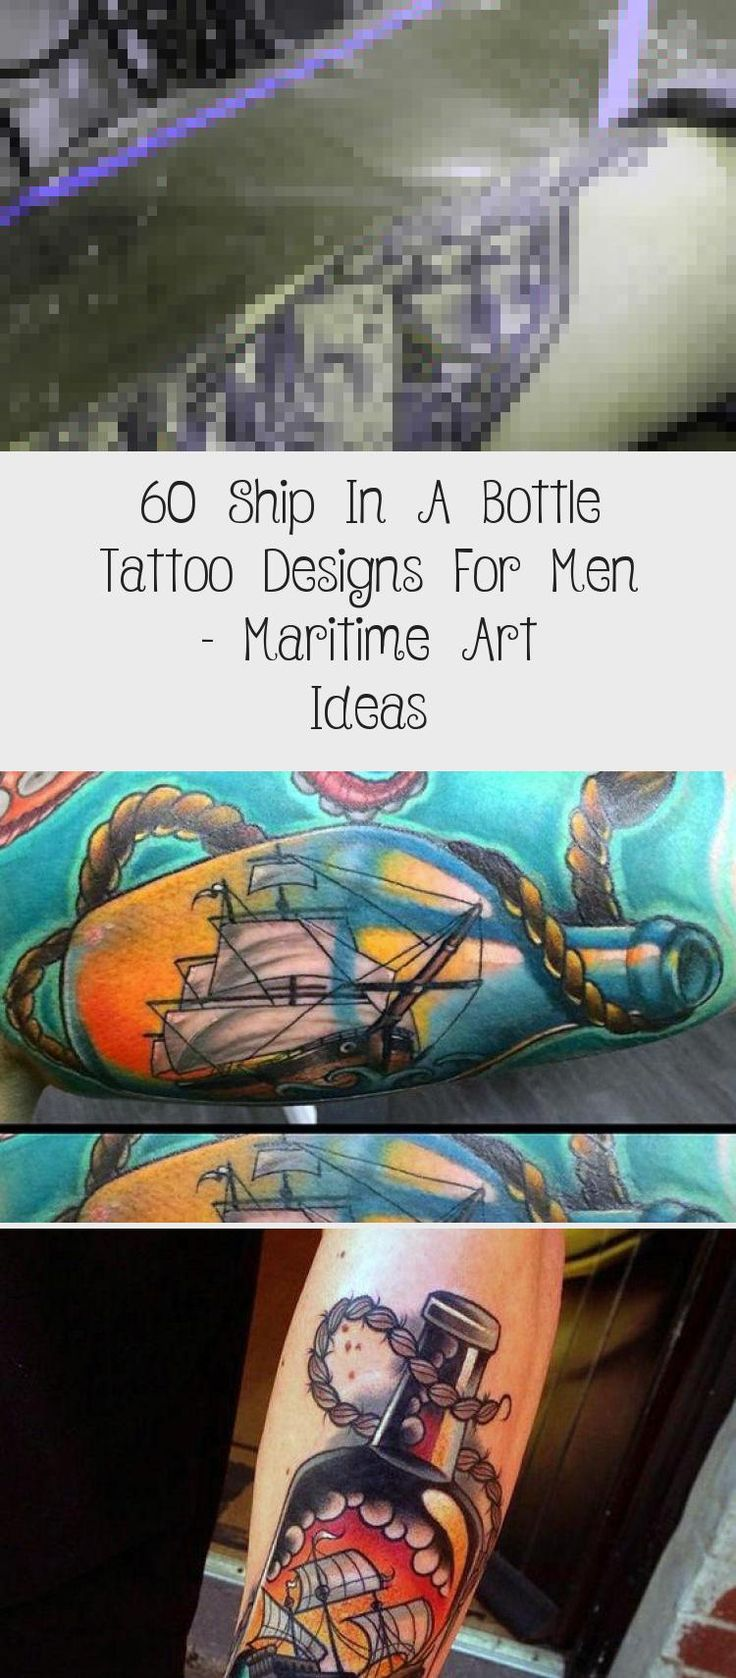 60 Ship In A Bottle Tattoo Designs For Men – Maritime Art Ideas   – black tattoo